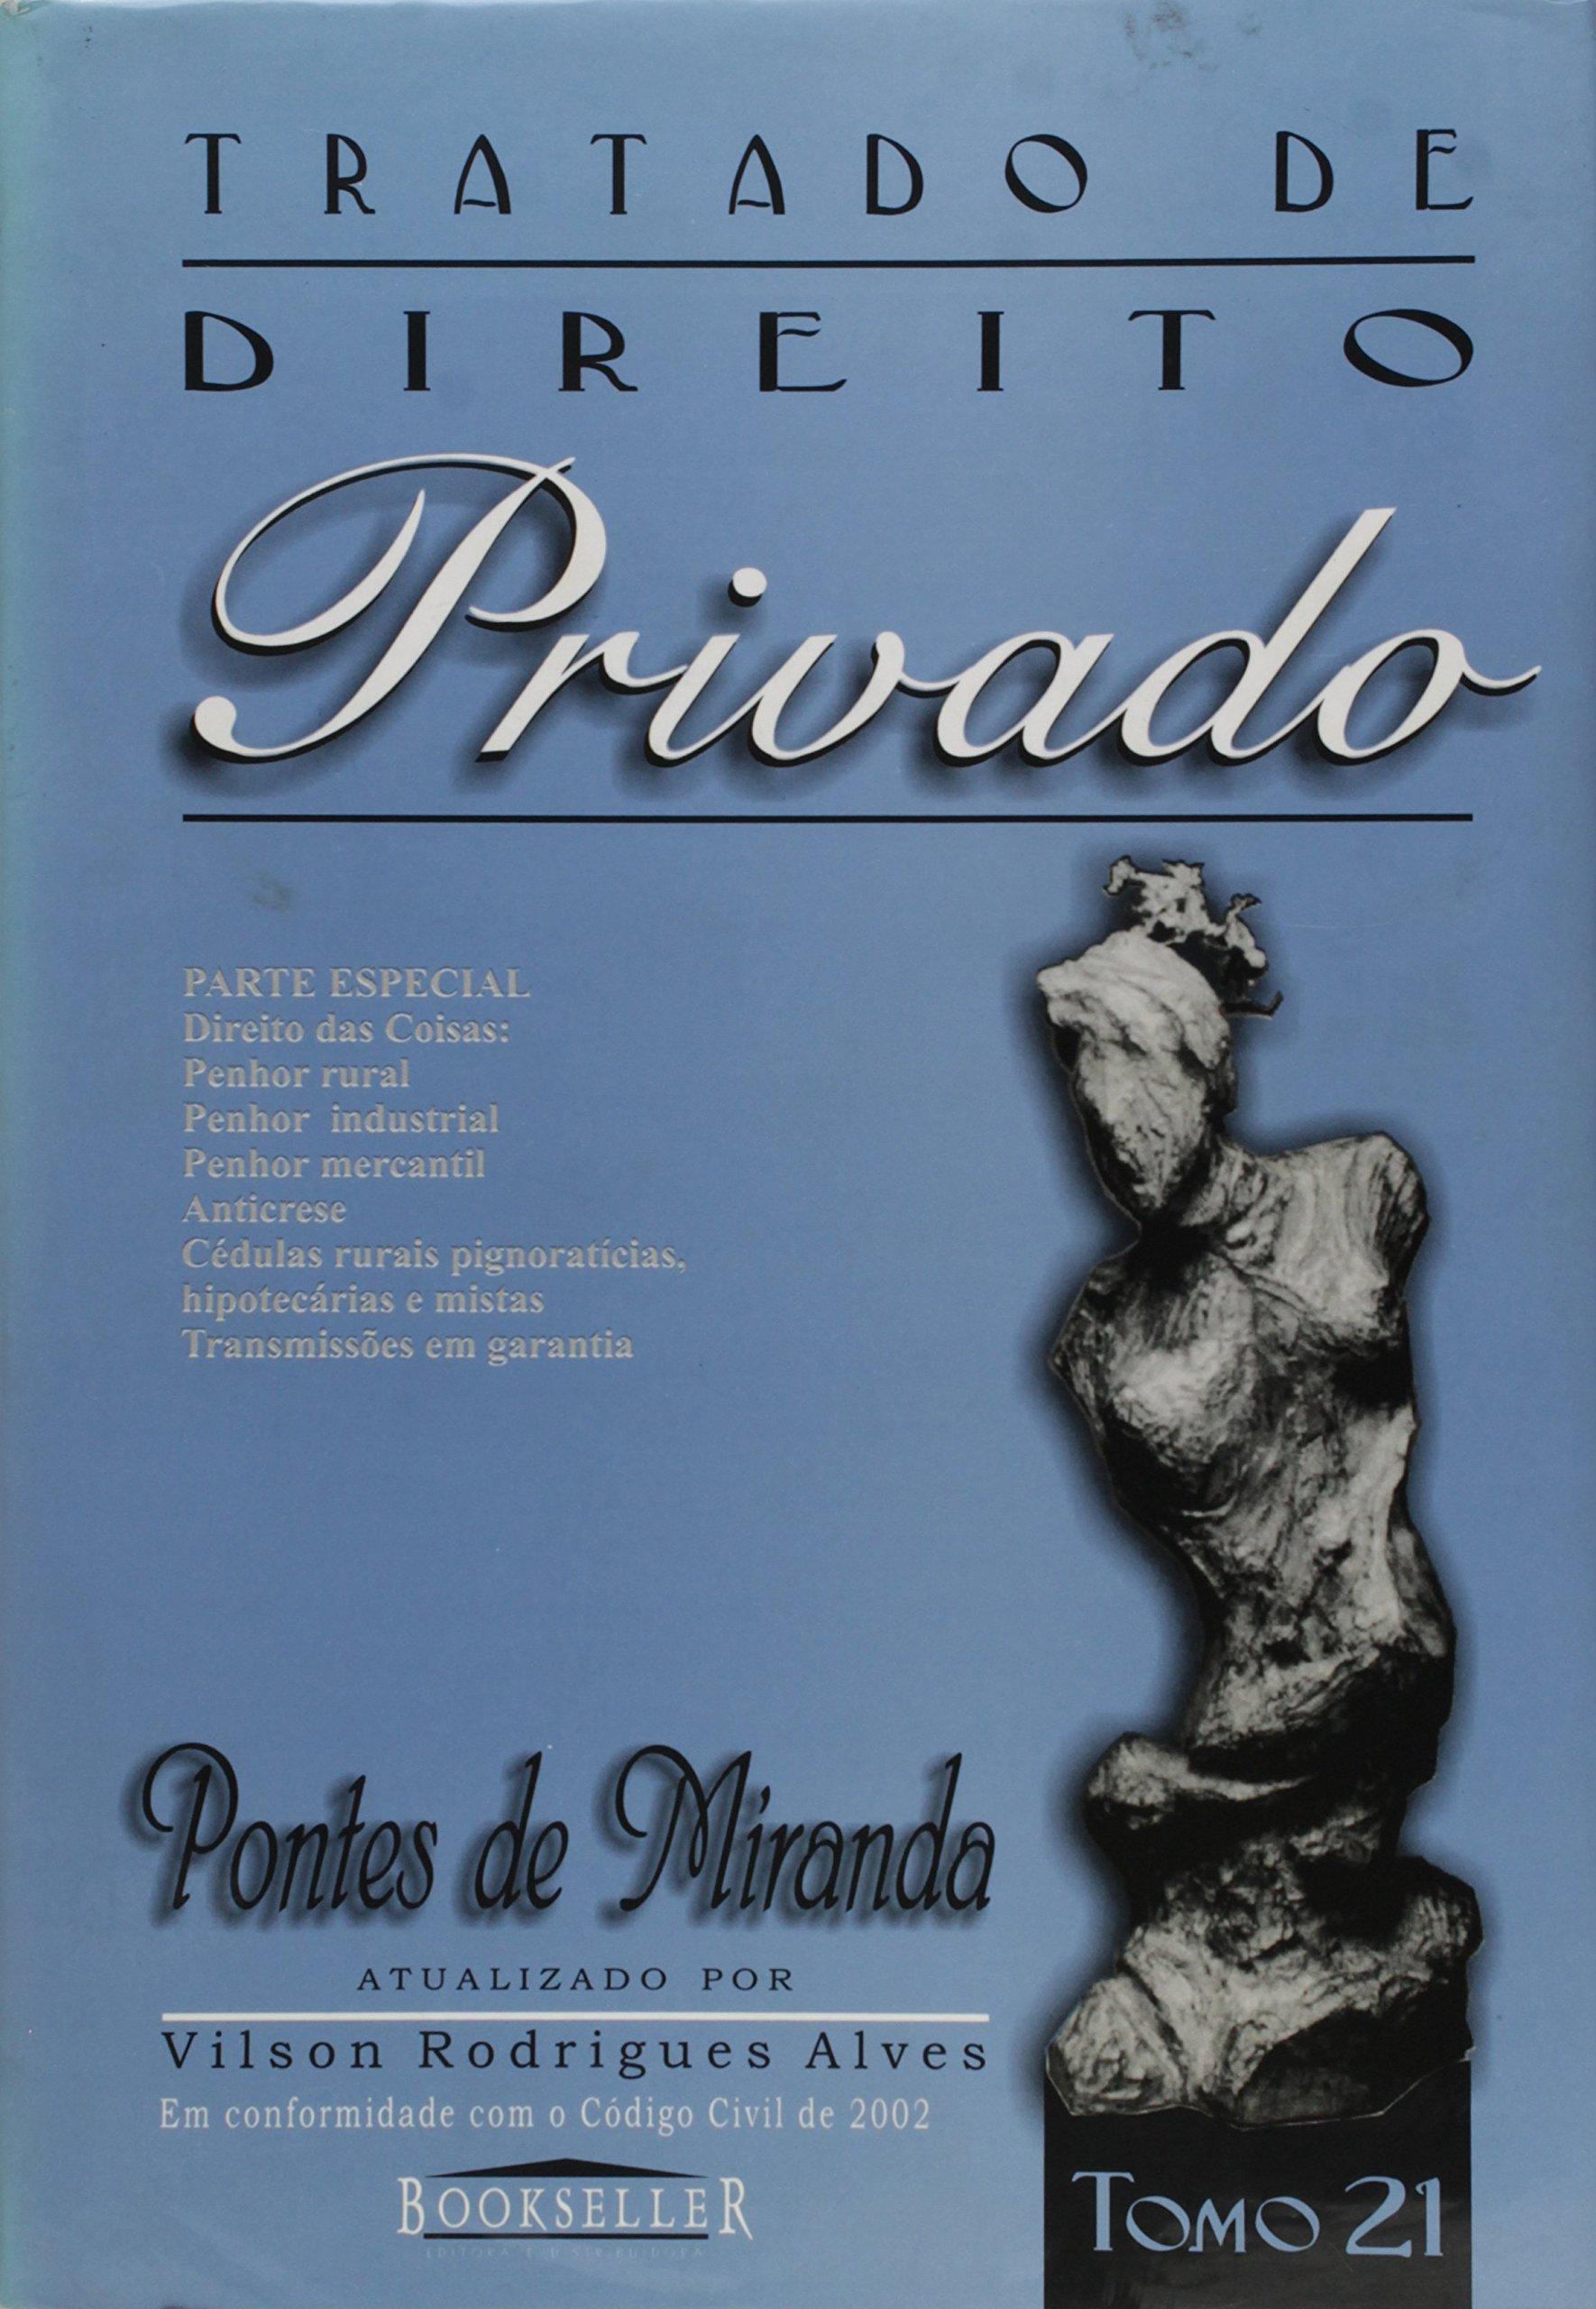 2009f2b480 Tratado de Direito Privado - Tomo 21 (Portuguese Brazilian) Paperback –  2003. by Pontes de Miranda ...